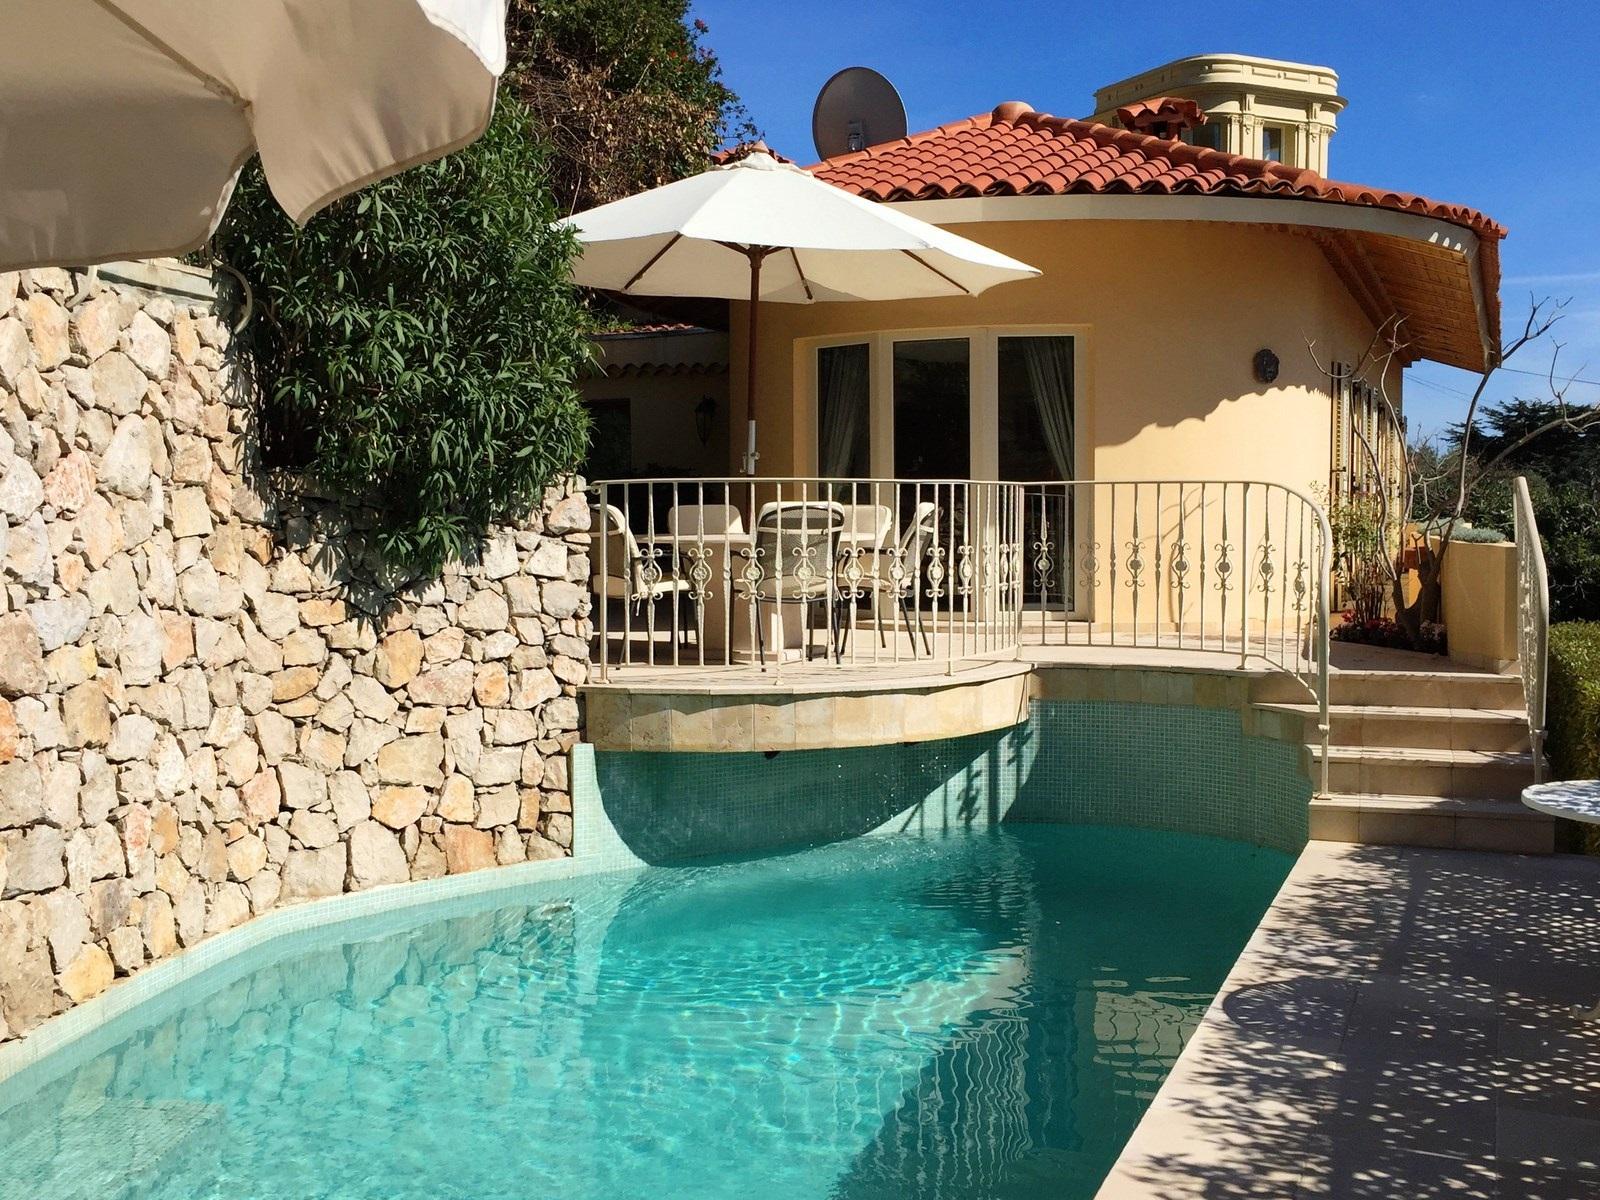 Продажа бизнеса недвижимости в монако свежие вакансии санкт-петербурга на экскаваторе на авито